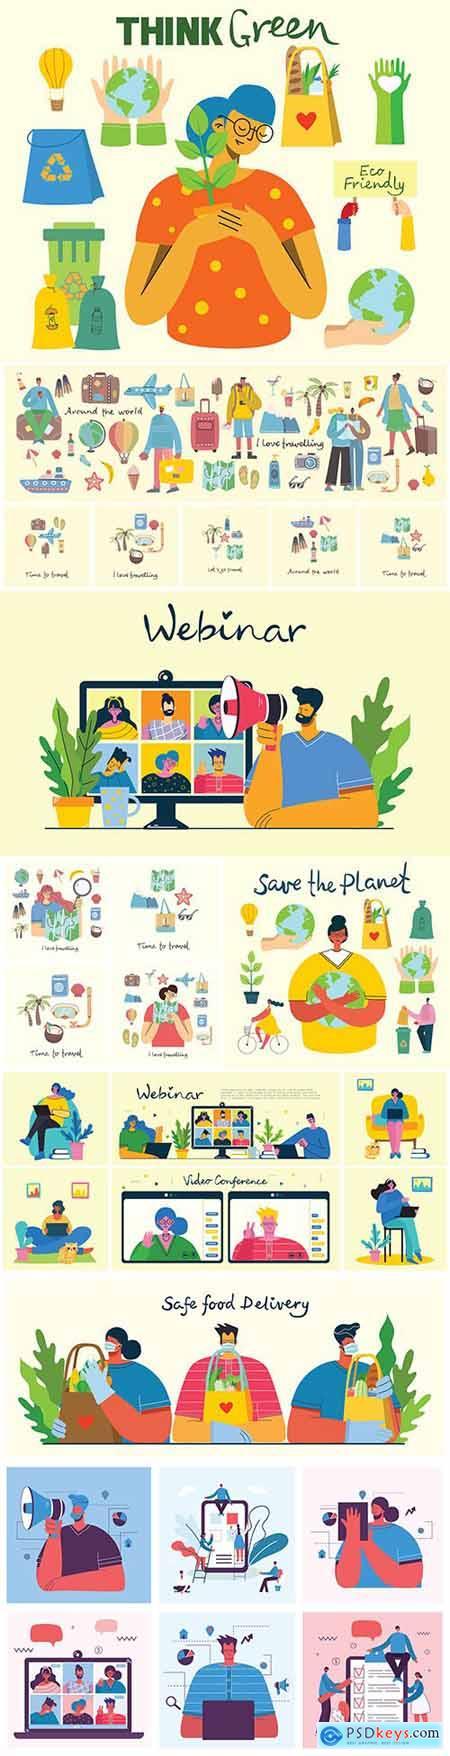 Online webinar concept illustrations and summer holiday journey